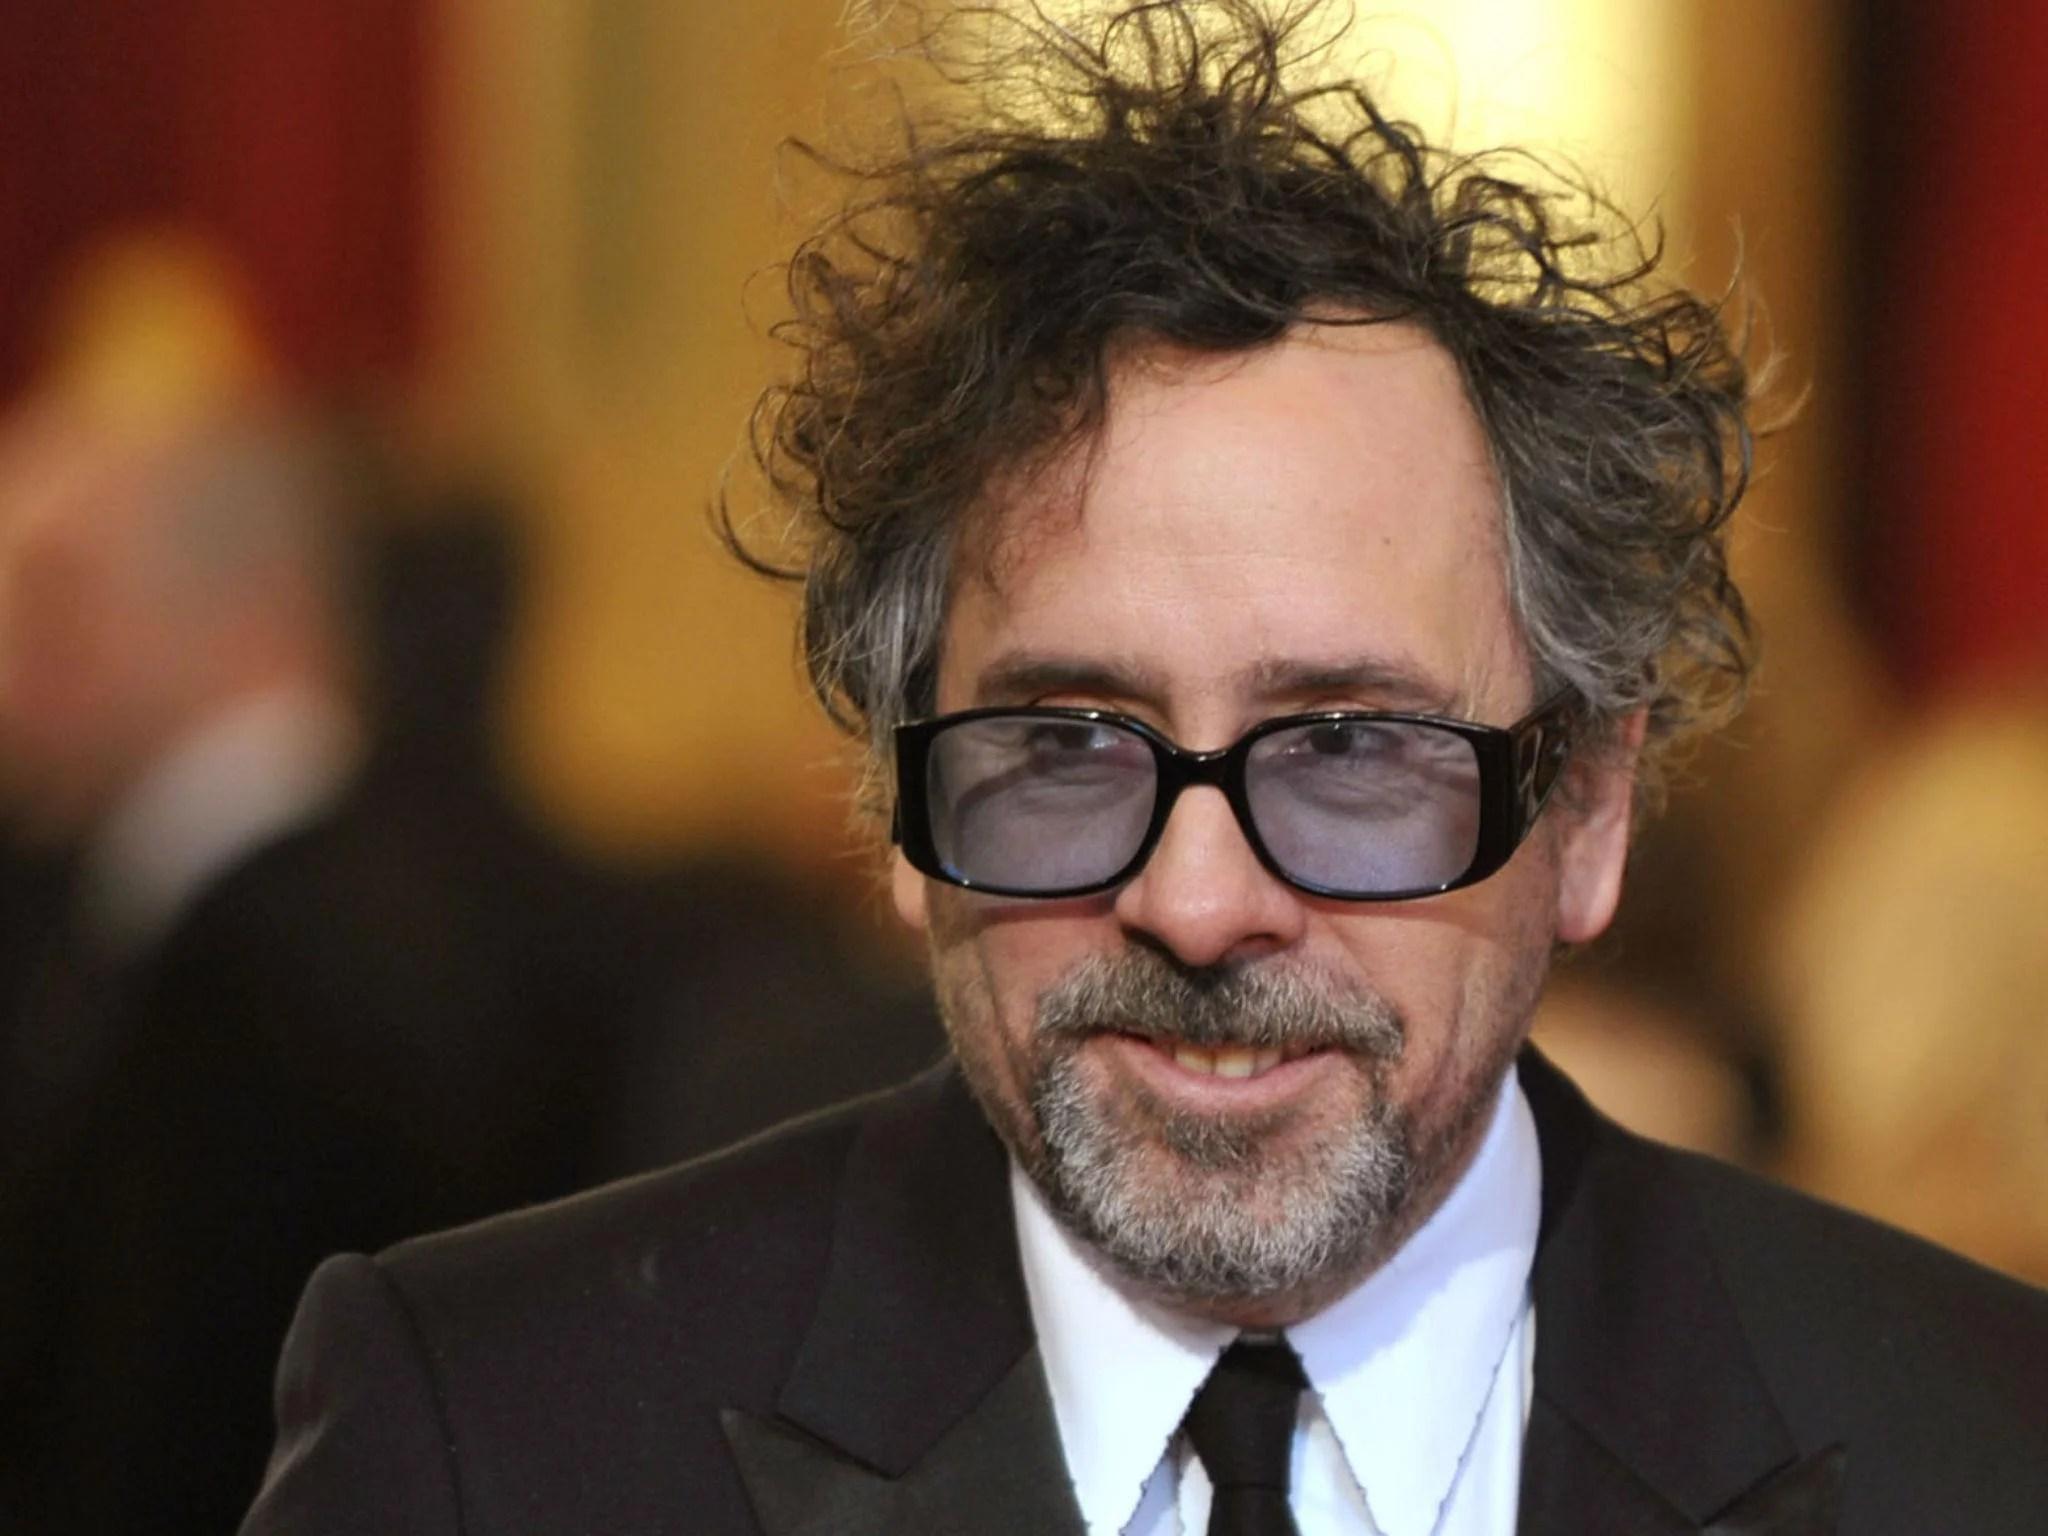 Tim Burton wearing sunglasses